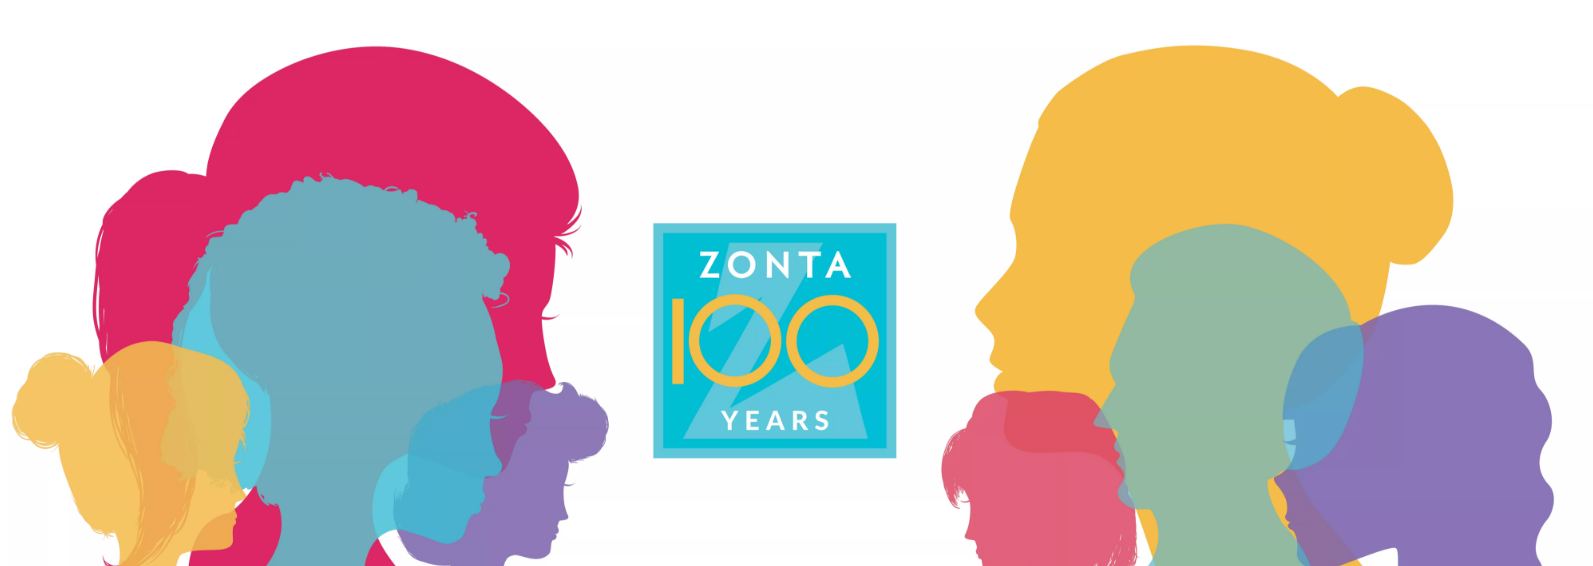 Zonta International Zonta100